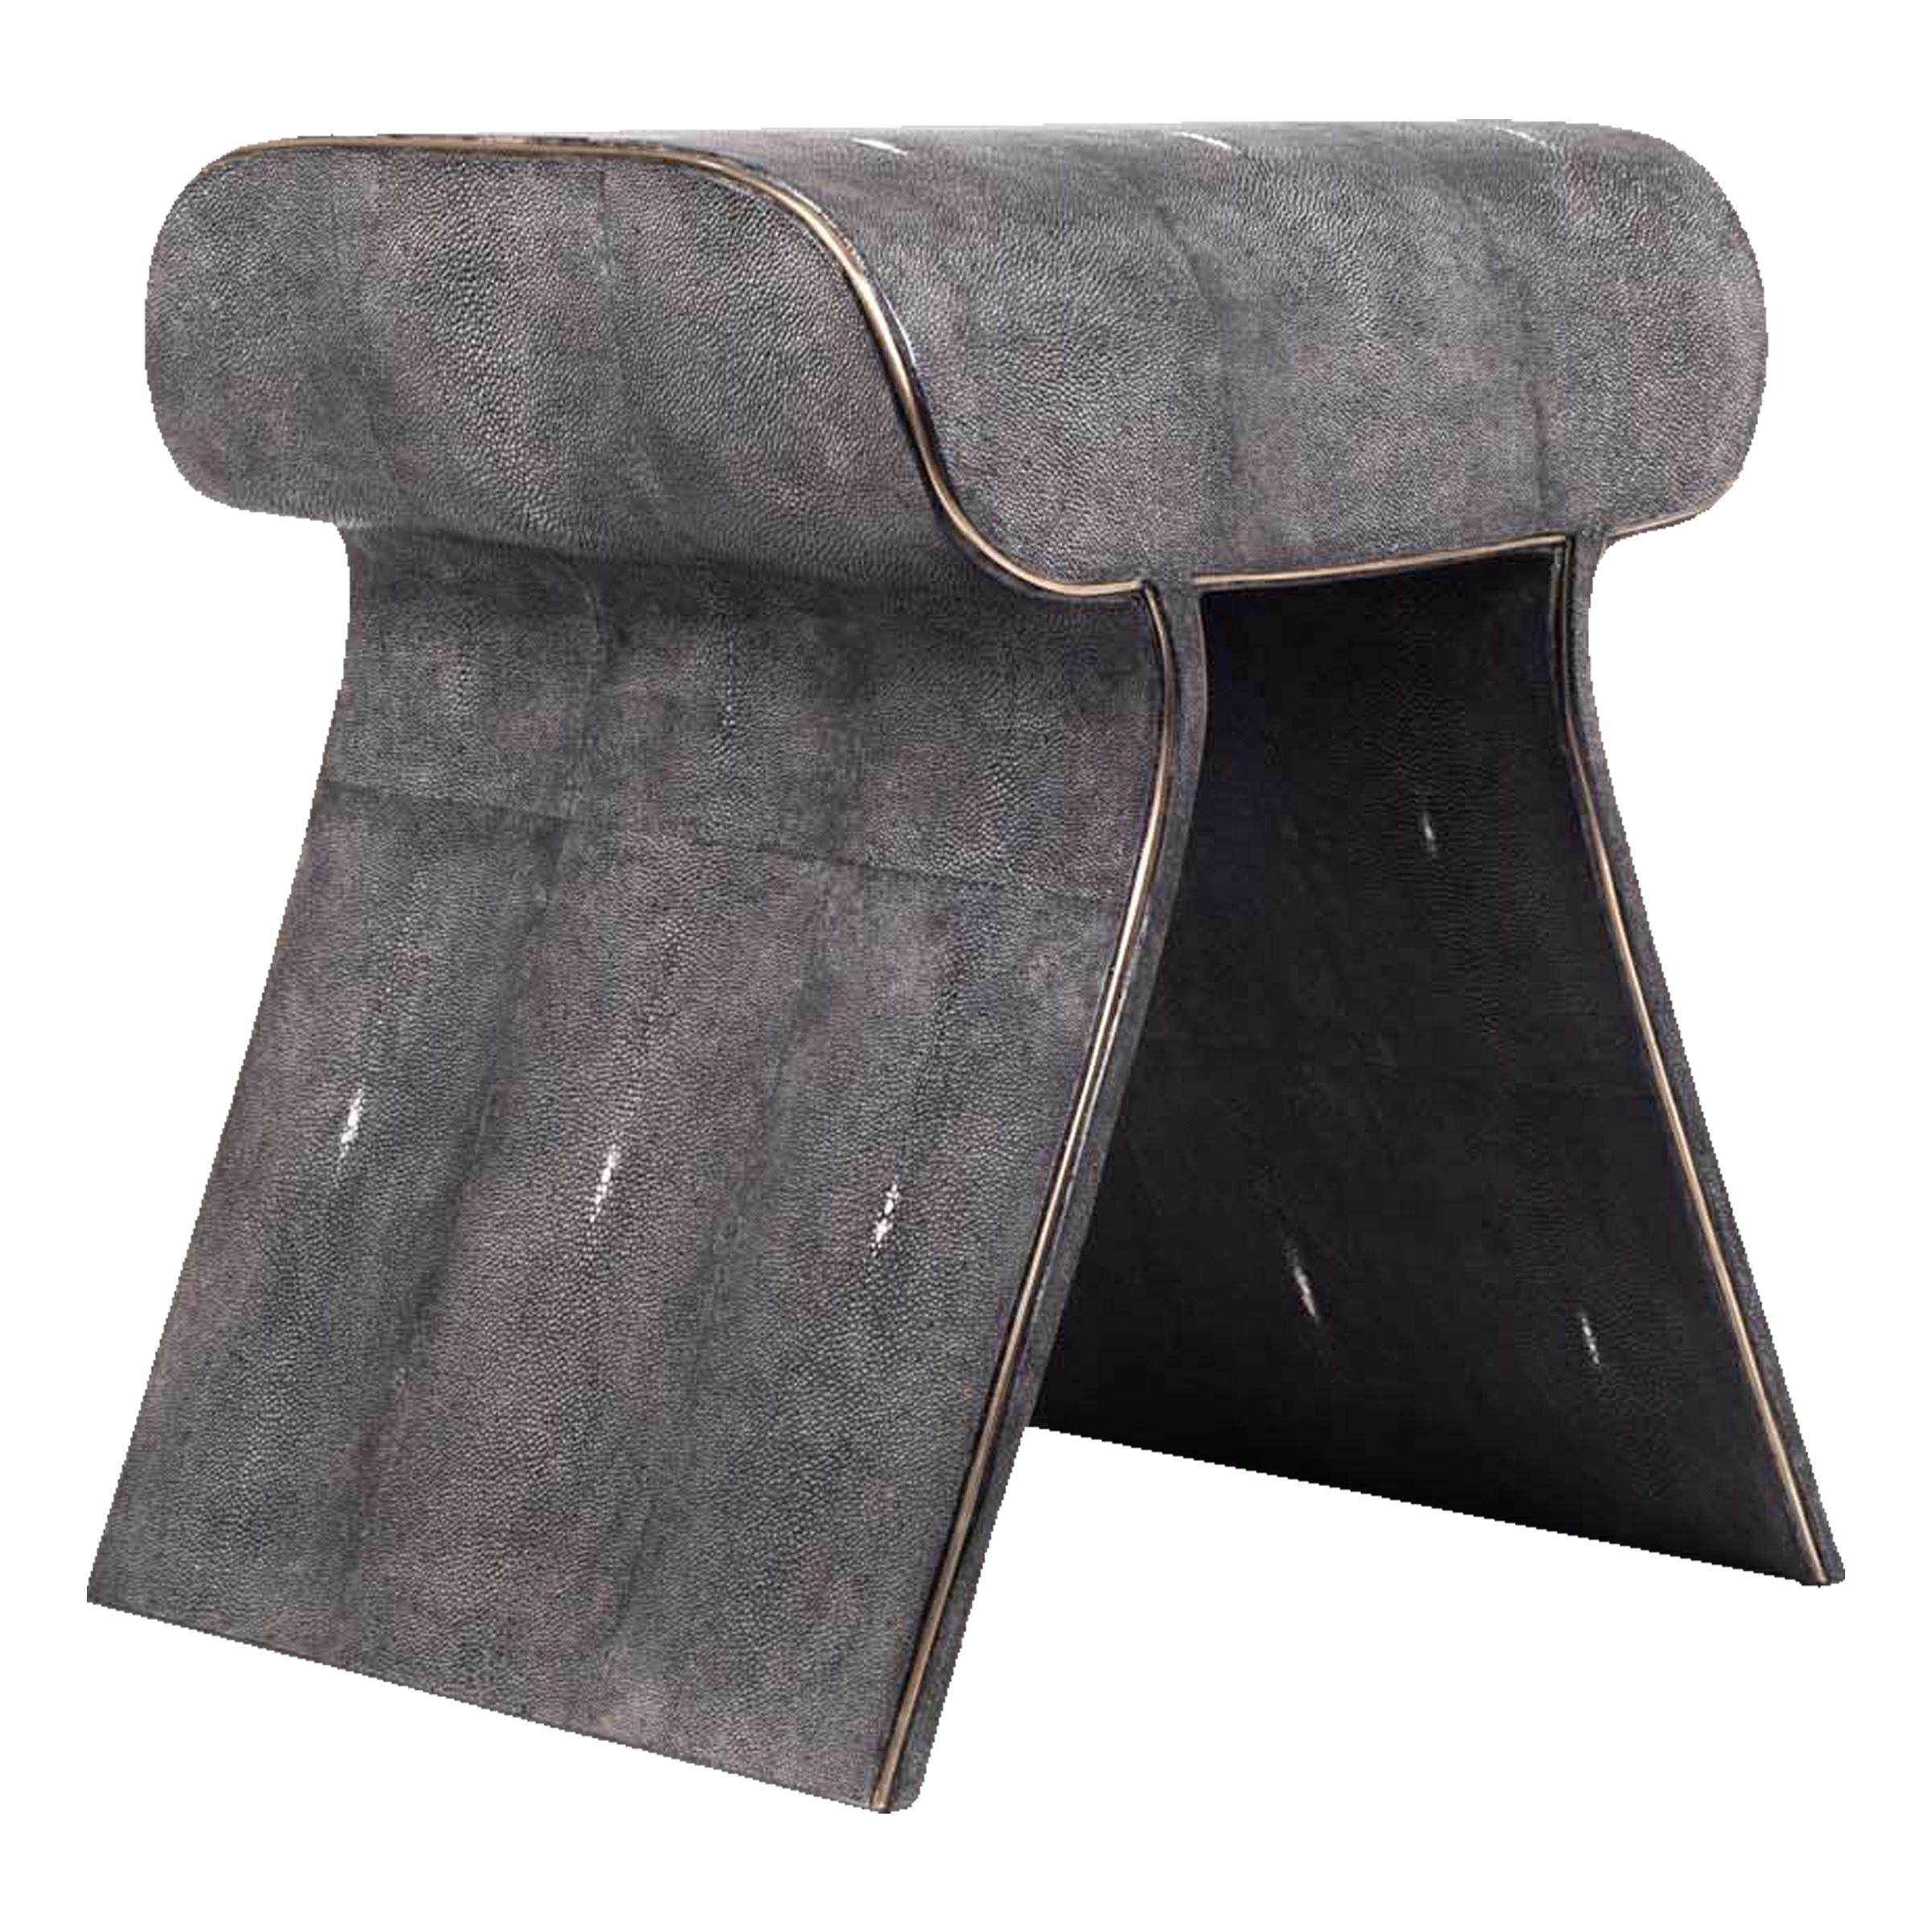 Dandy Stool in Black Shagreen with Bronze-Patina Brass Details by Kifu Paris